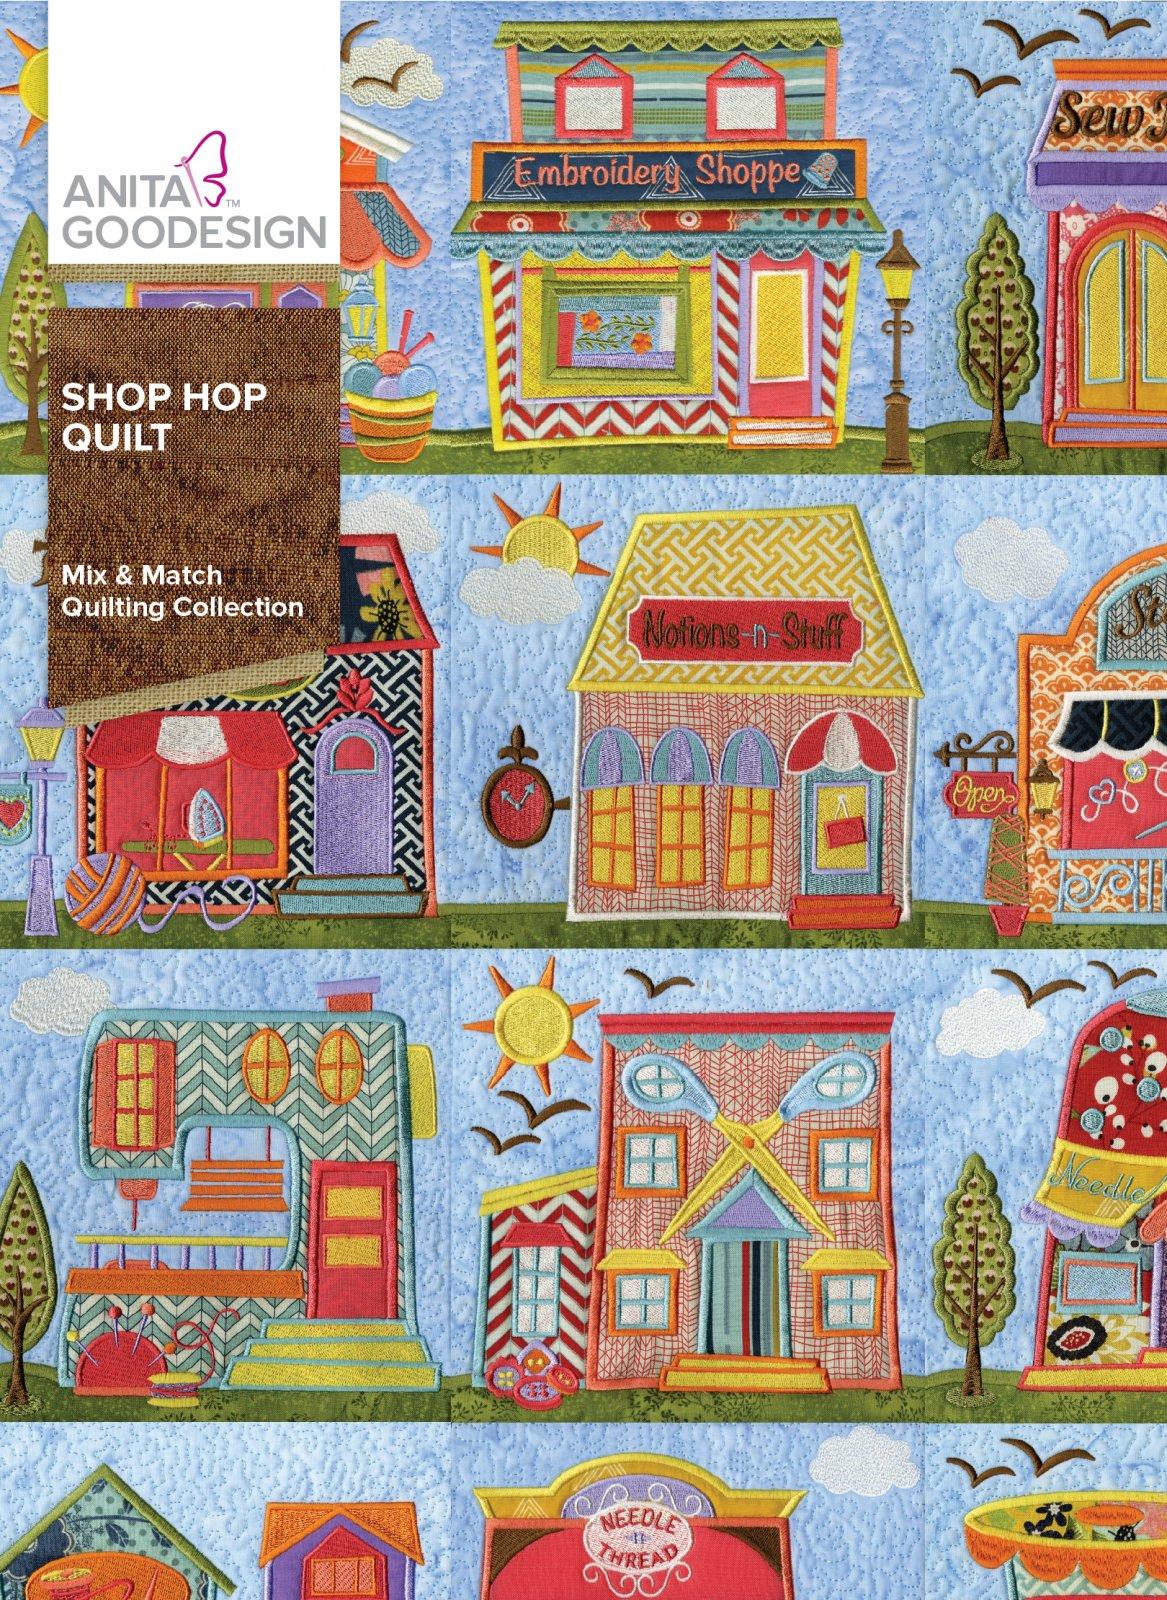 Anita Goodesign shop hop quilt